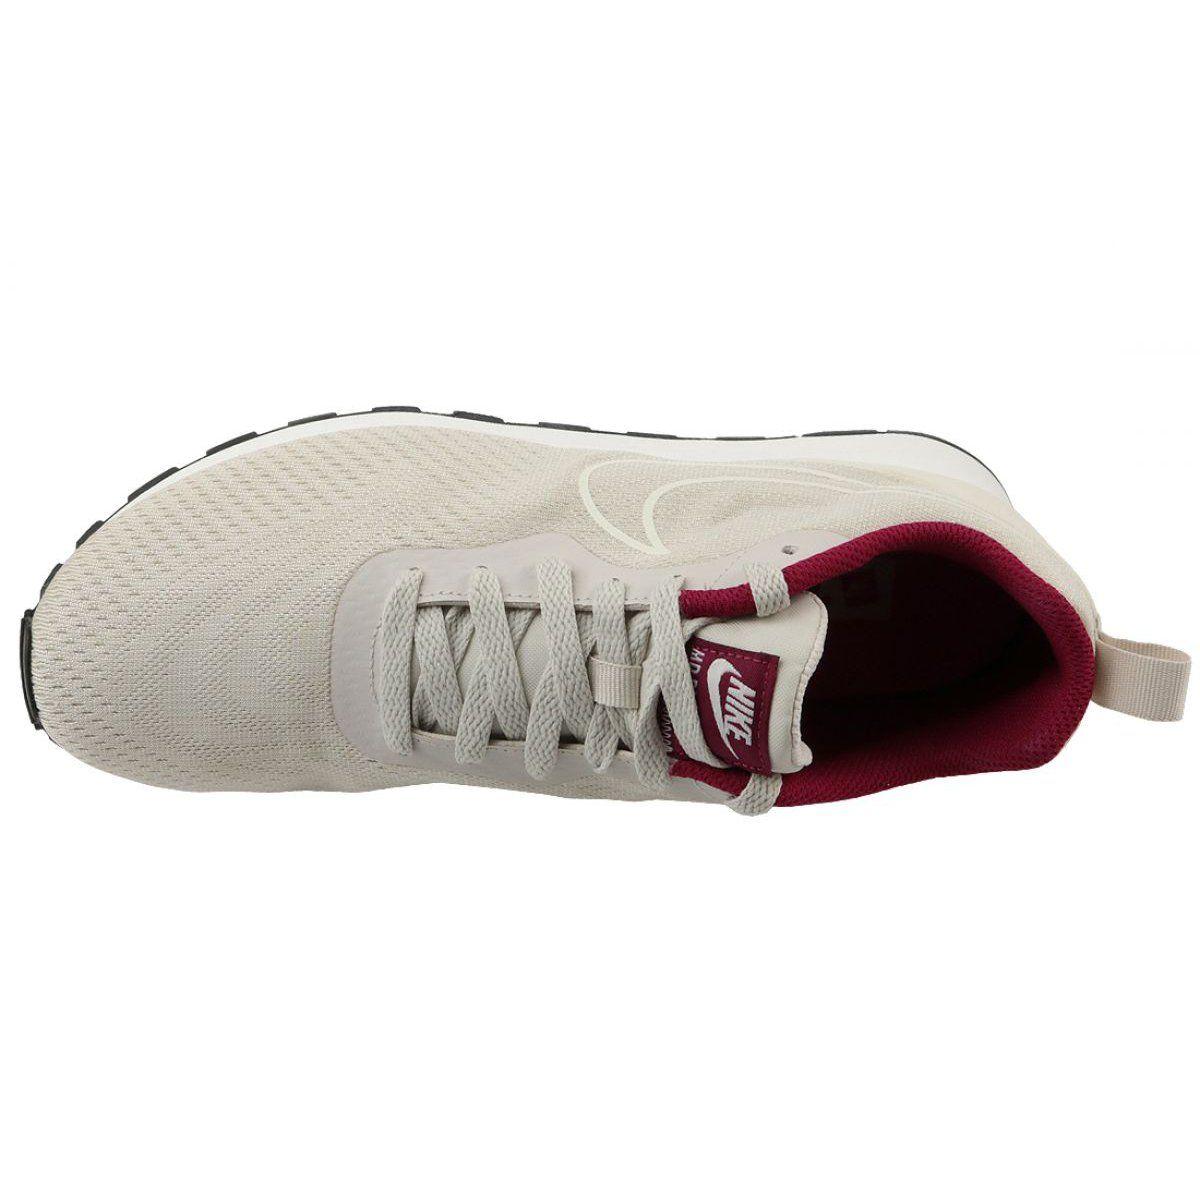 Sports Women S Nike Nike Md Runner 2 Eng Mesh W 916797 100 Shoes White Nike Nike Shoes Women Nike Shoes